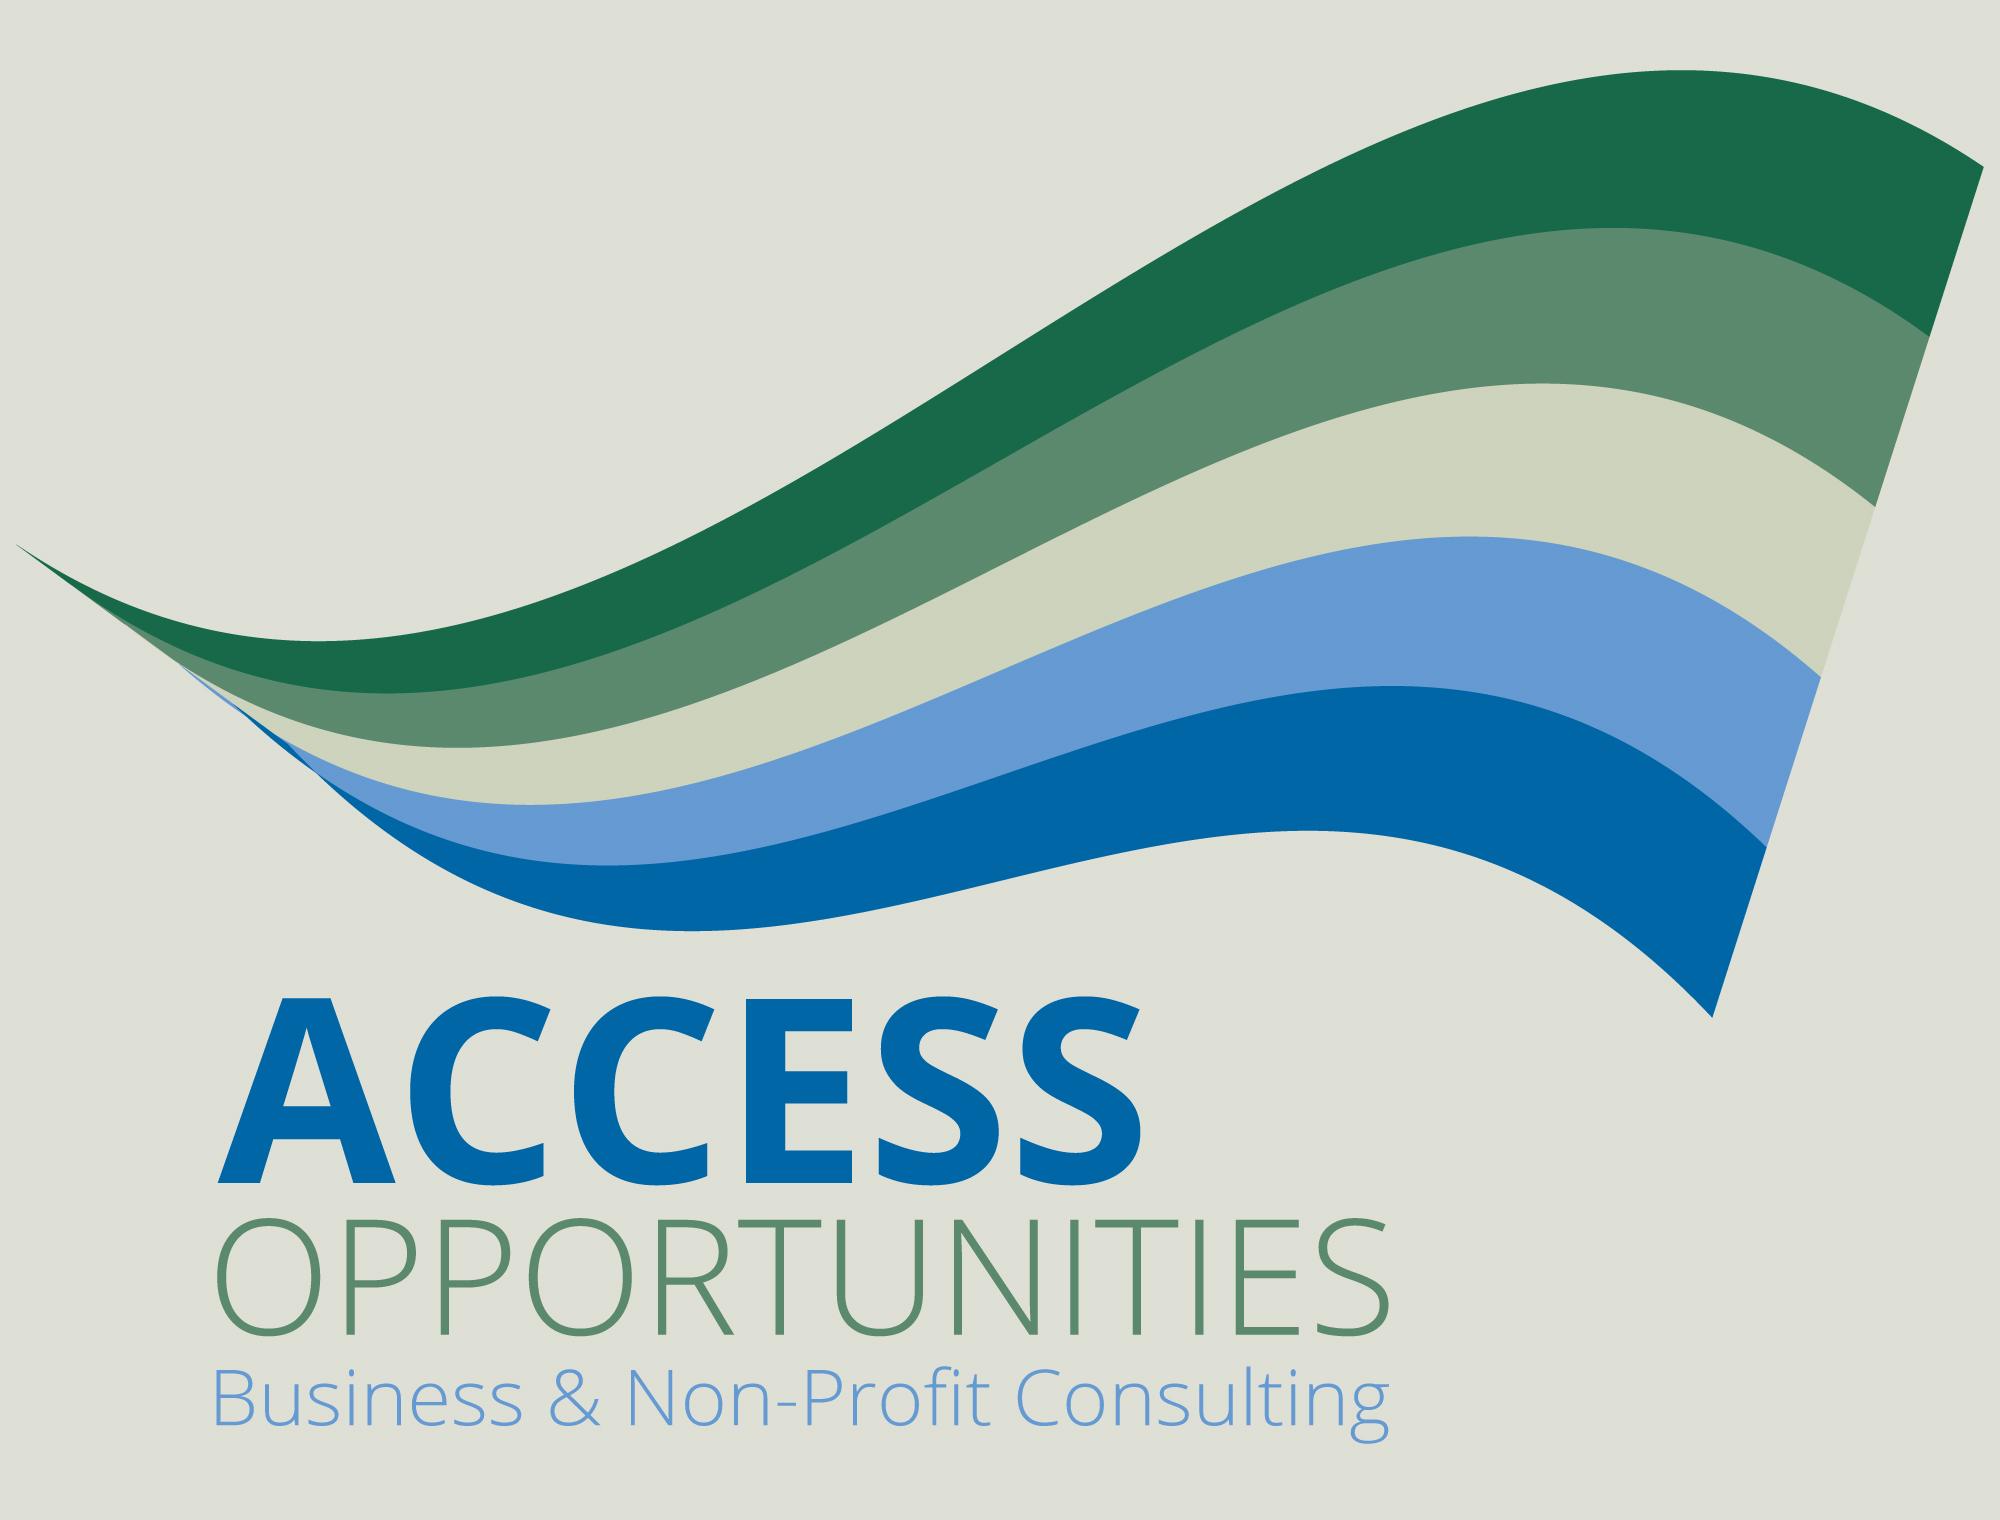 Access Opportunities